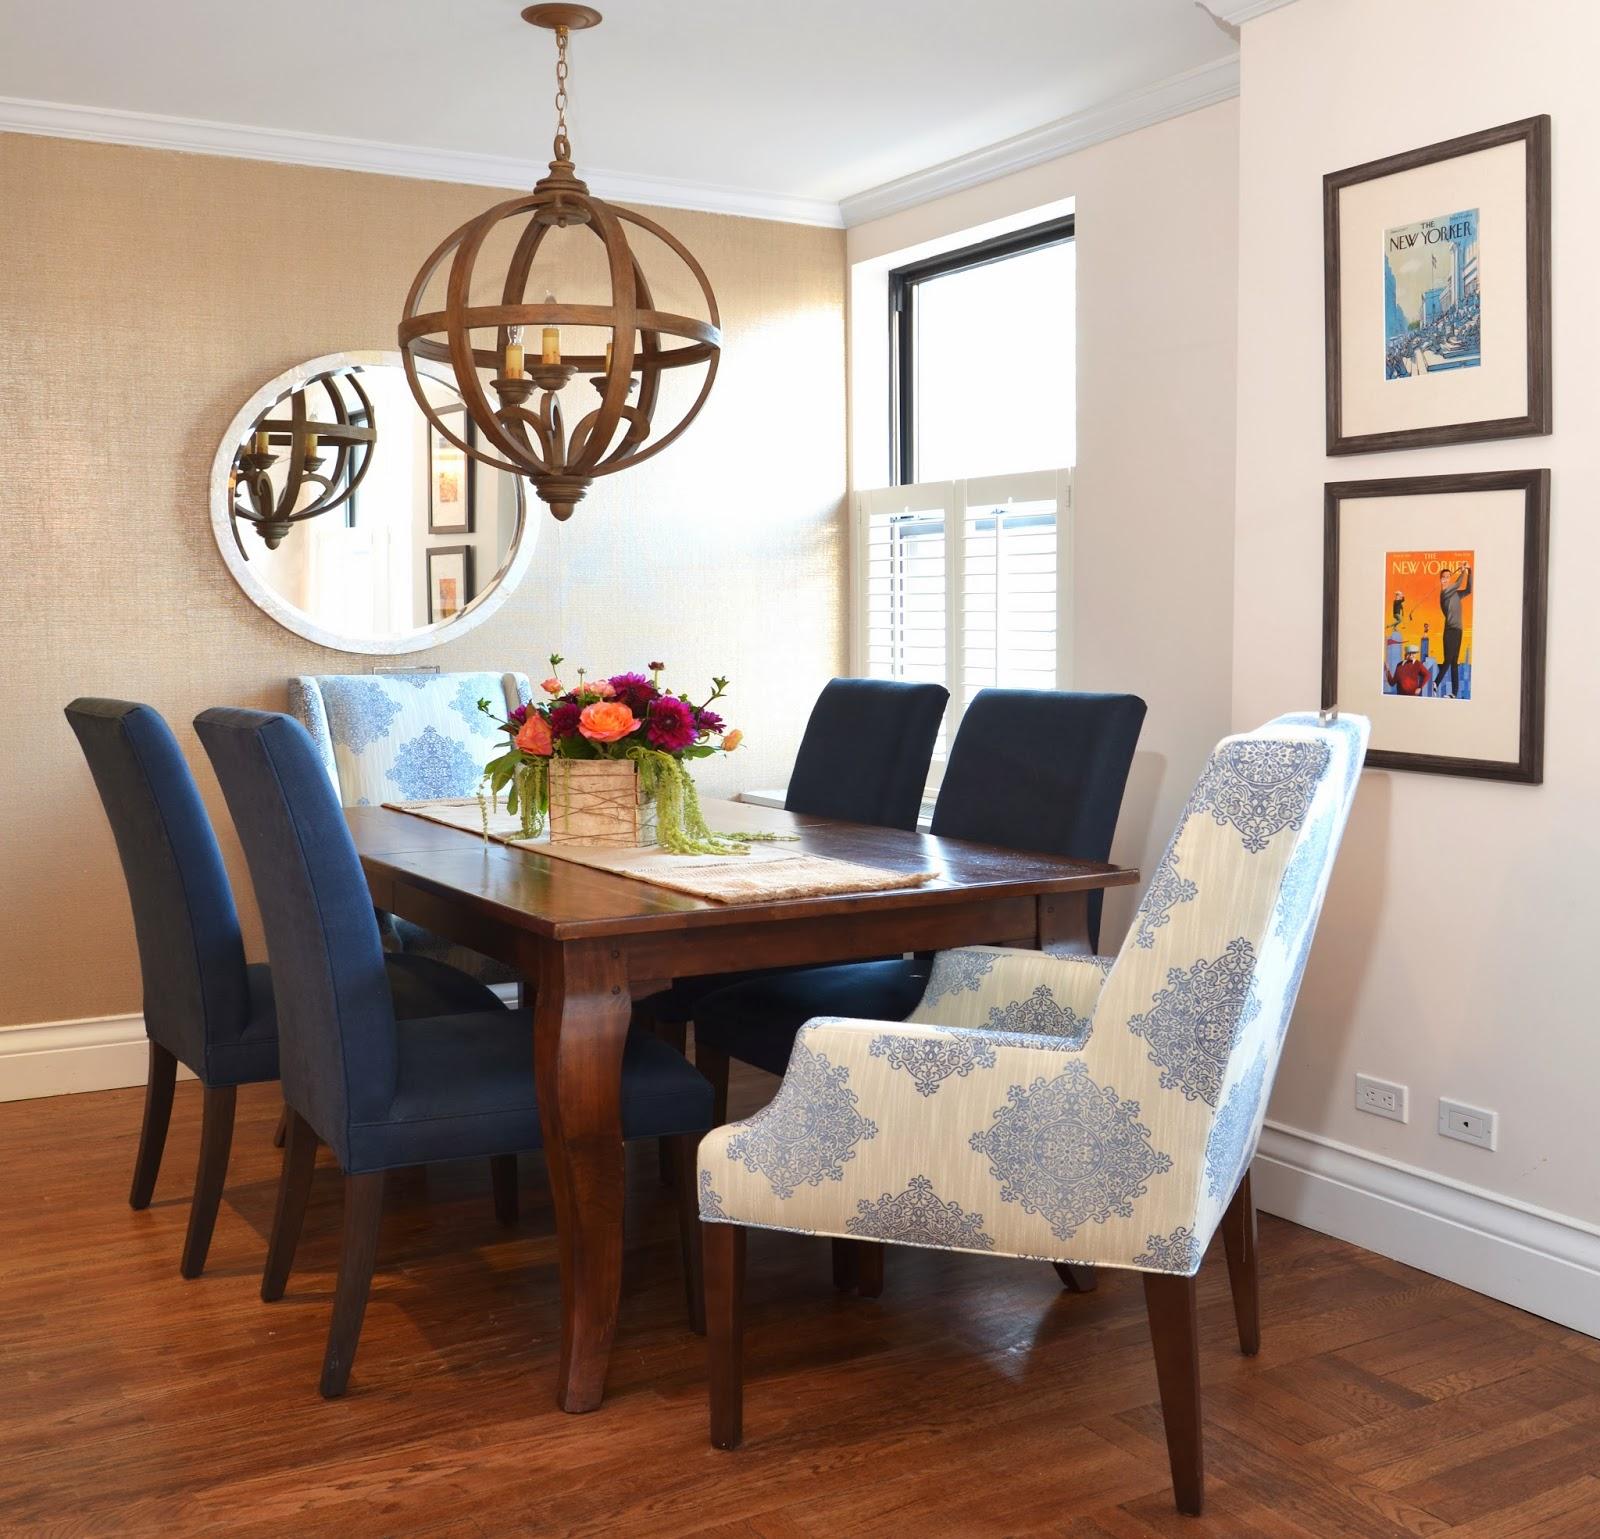 Upper West Side Apartments: A Love Affair With Design: PORTFOLIO